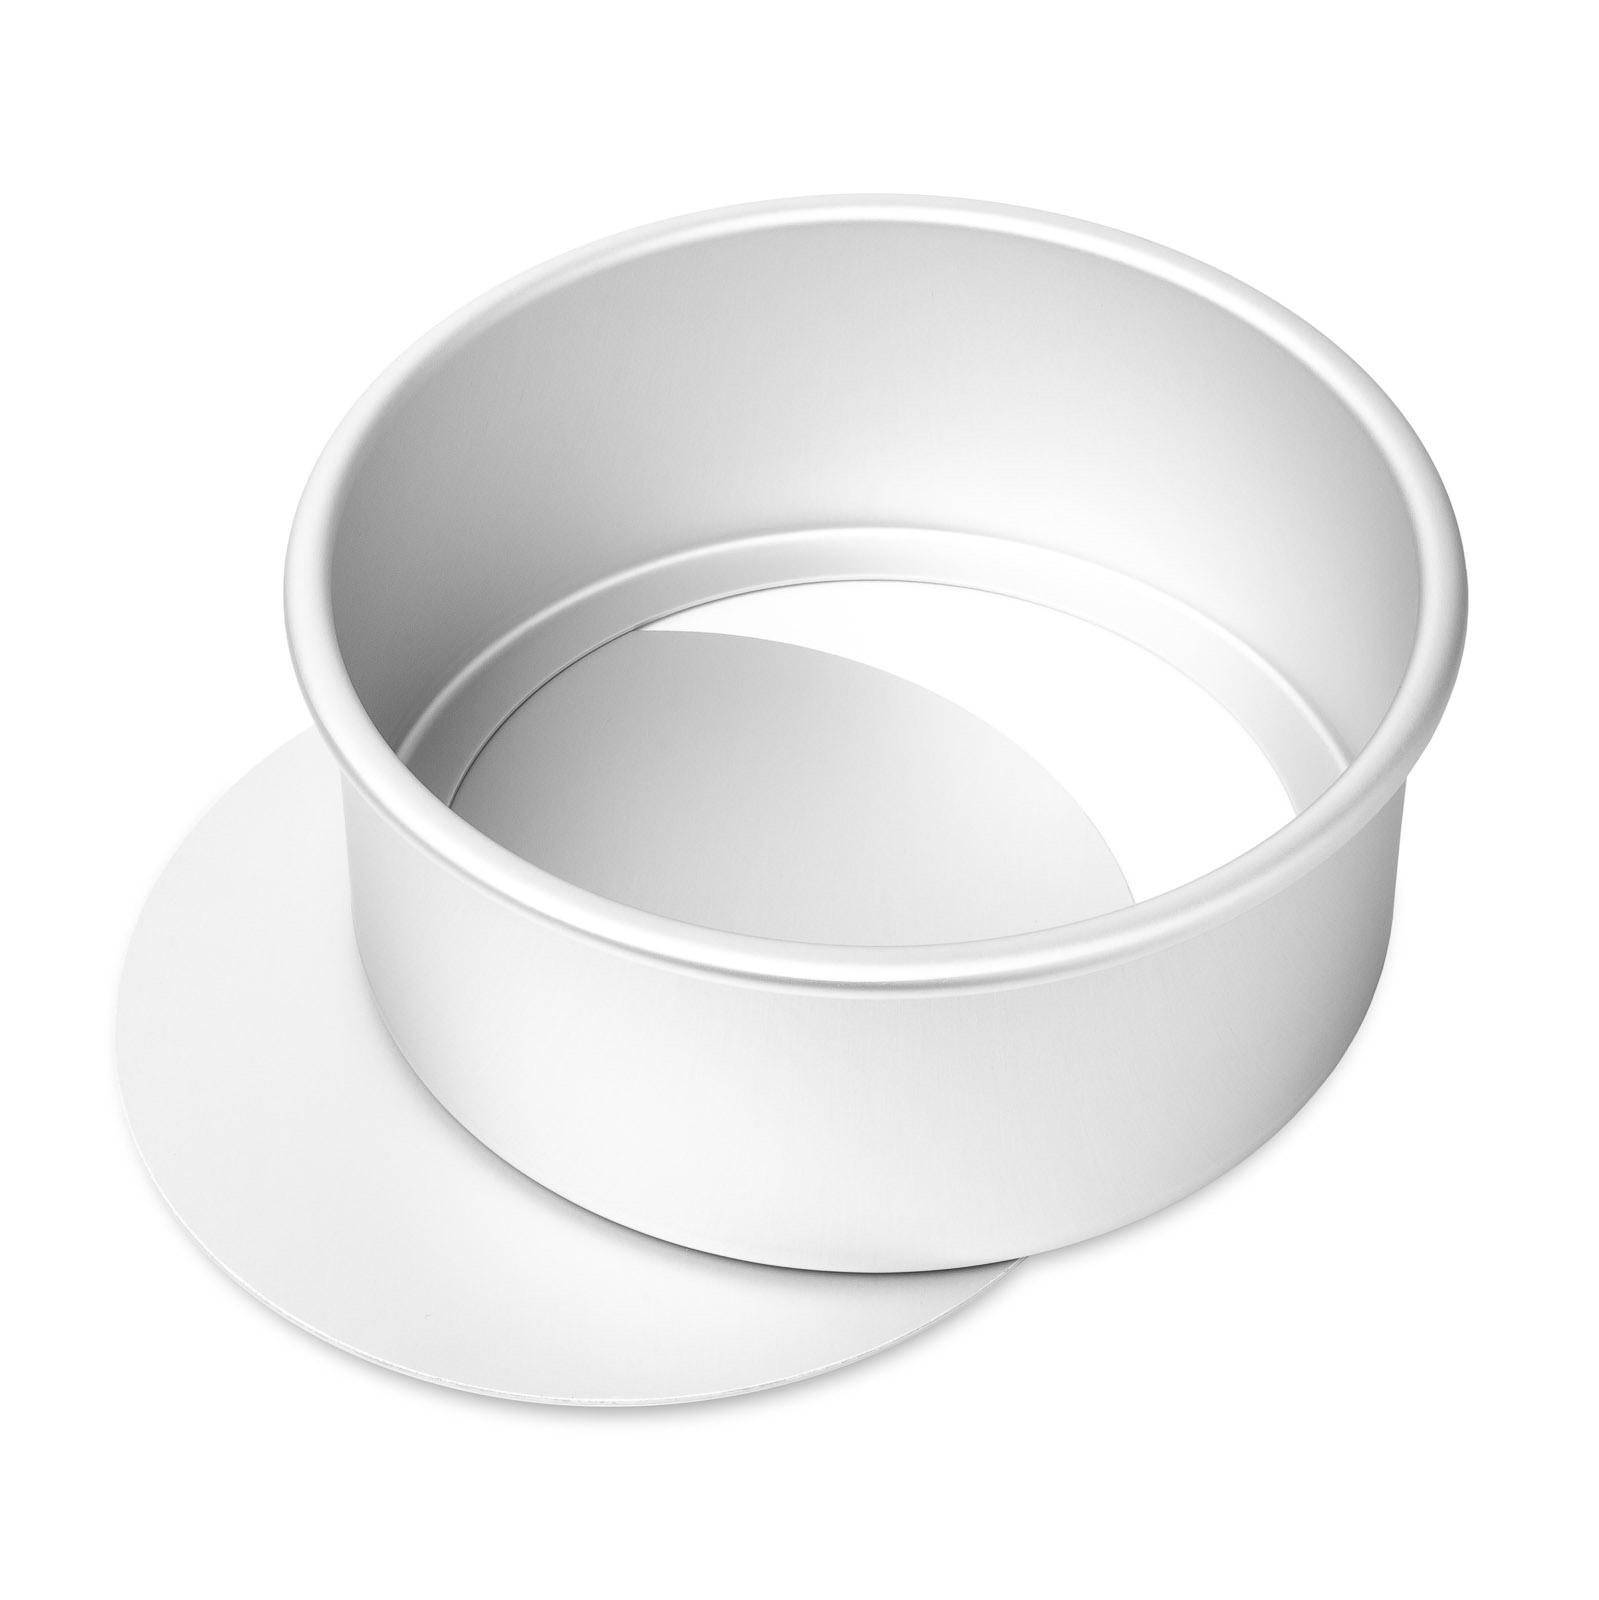 Professional Cheesecake Aluminum Cake Pan Baking Tin